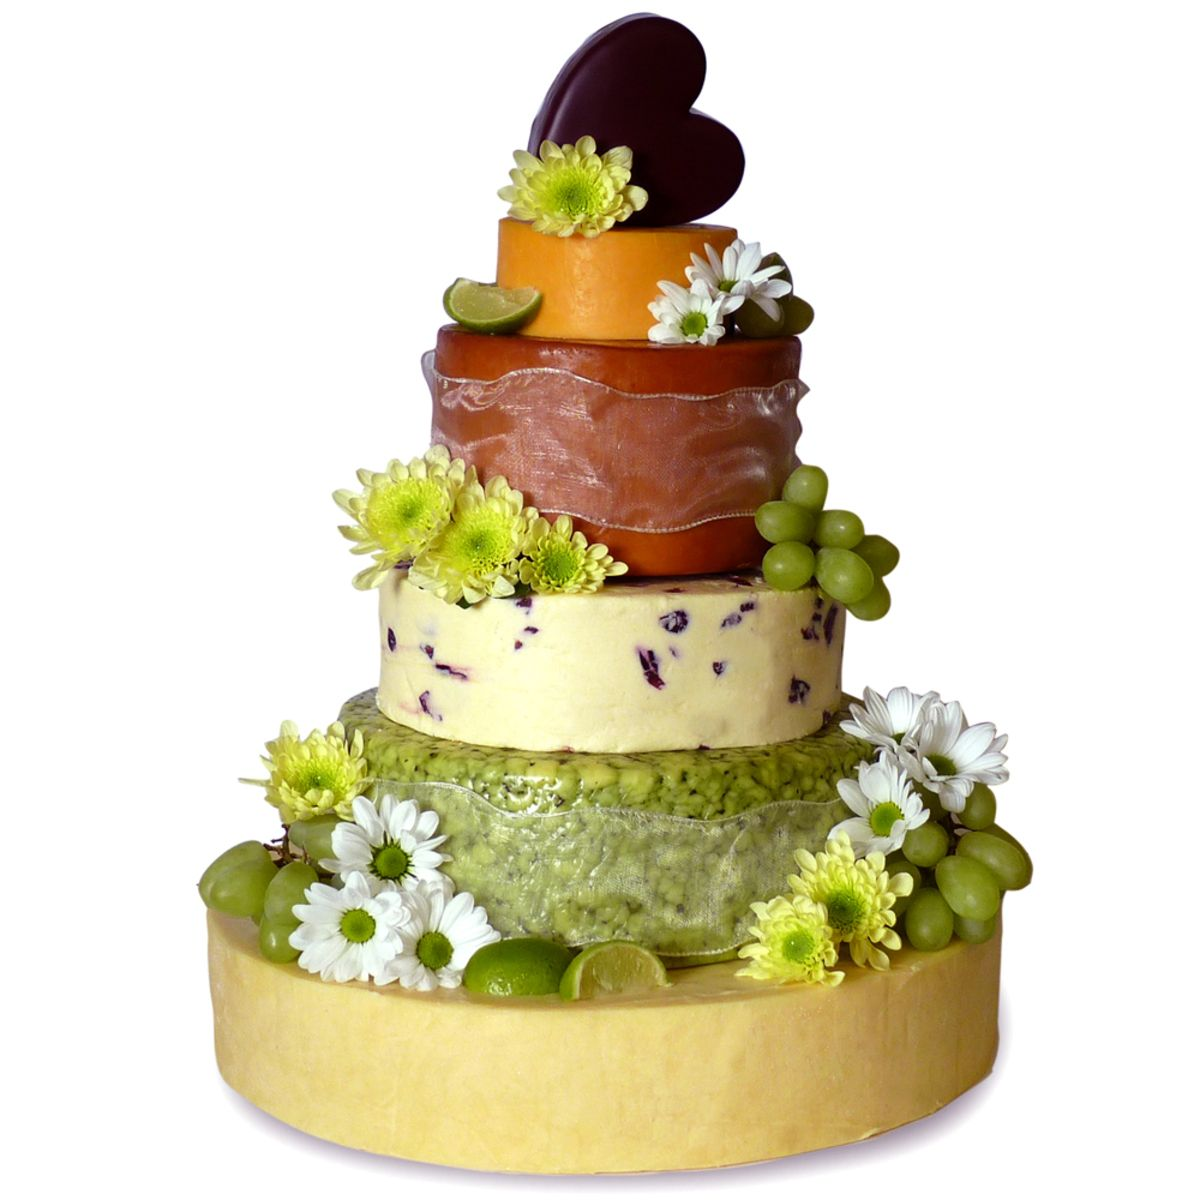 The Dorchester 6-Tier Cheese Celebration Cake, 15kg (Serves 150-200 ...